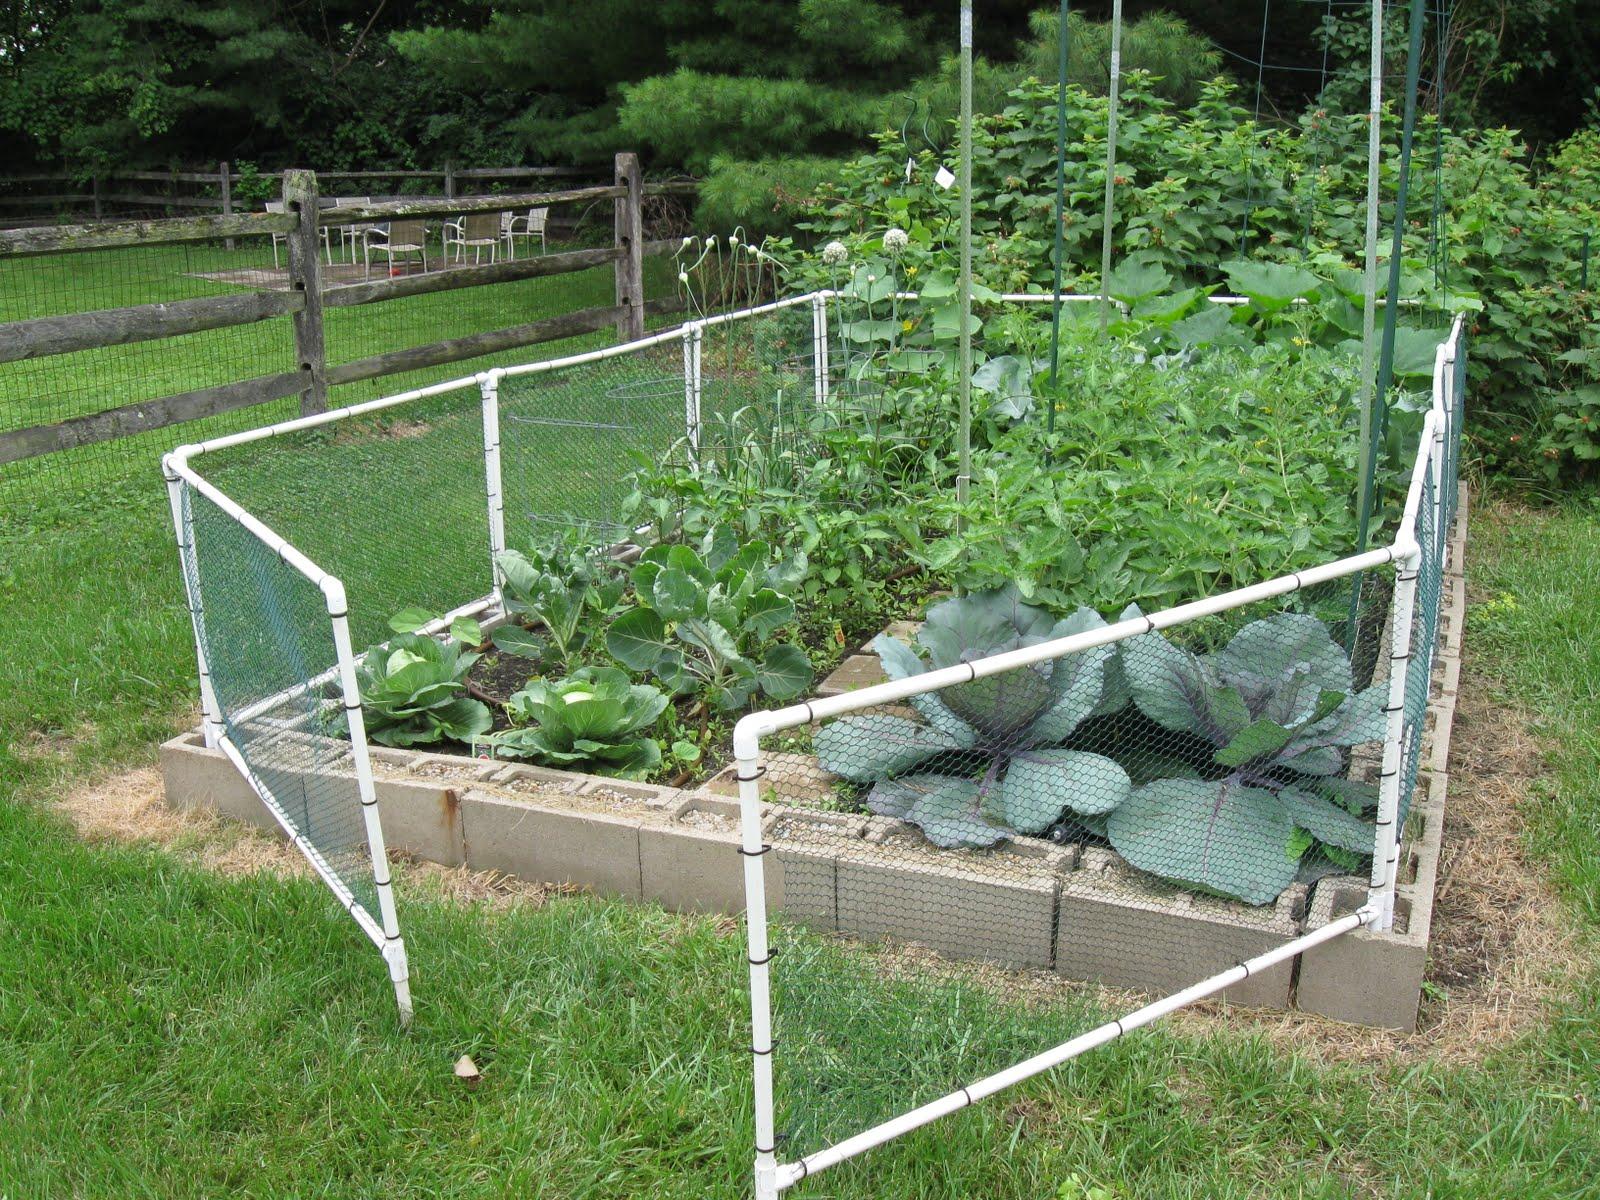 Garden Fences Ideas: One Hoosier's View